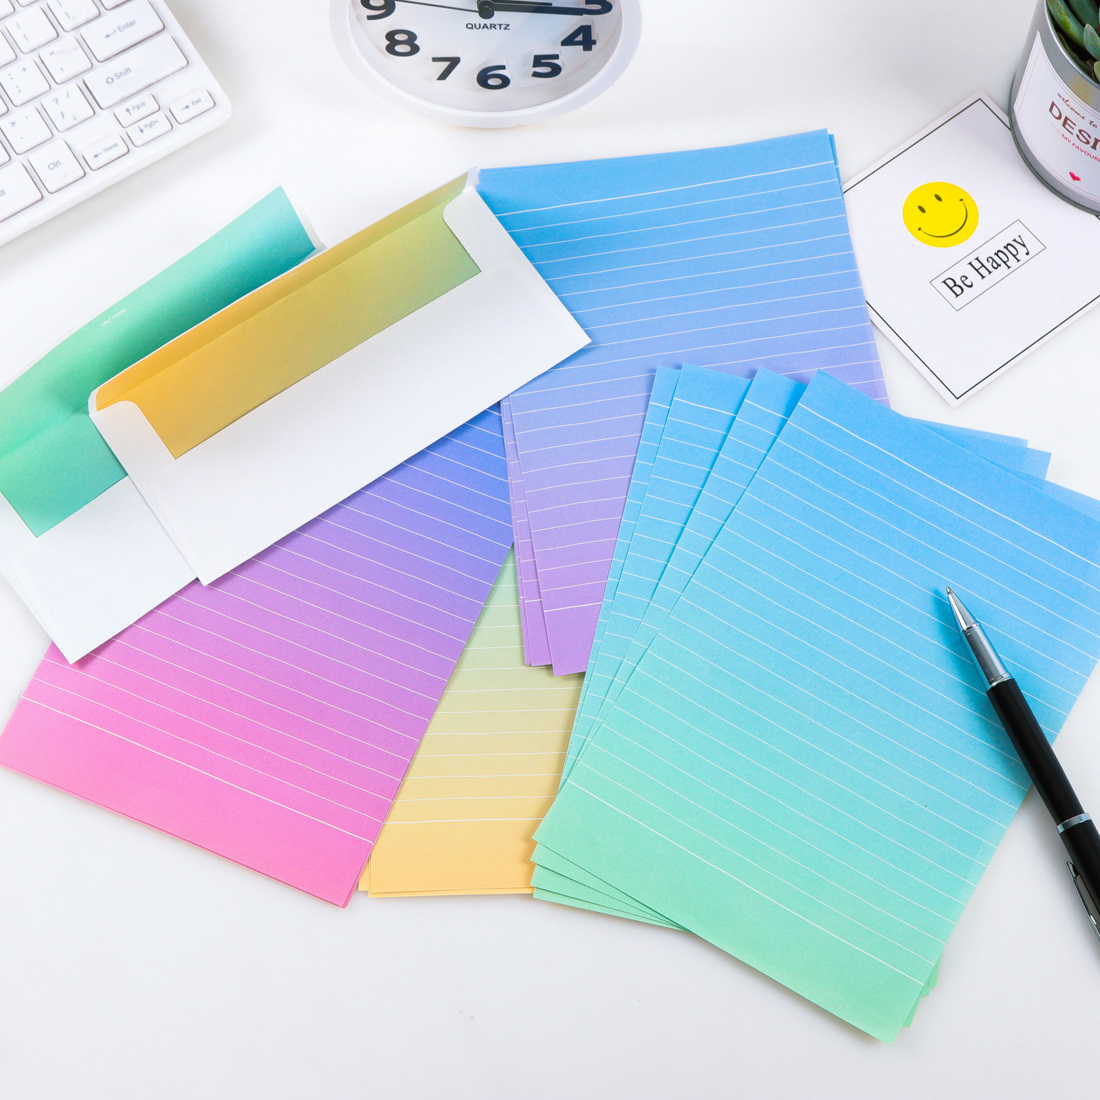 FangNymph Gradient Envelopes Cute Kawaii Flower Writing Paper Letter Set For Kids Gift School Supplies Student School Supplies